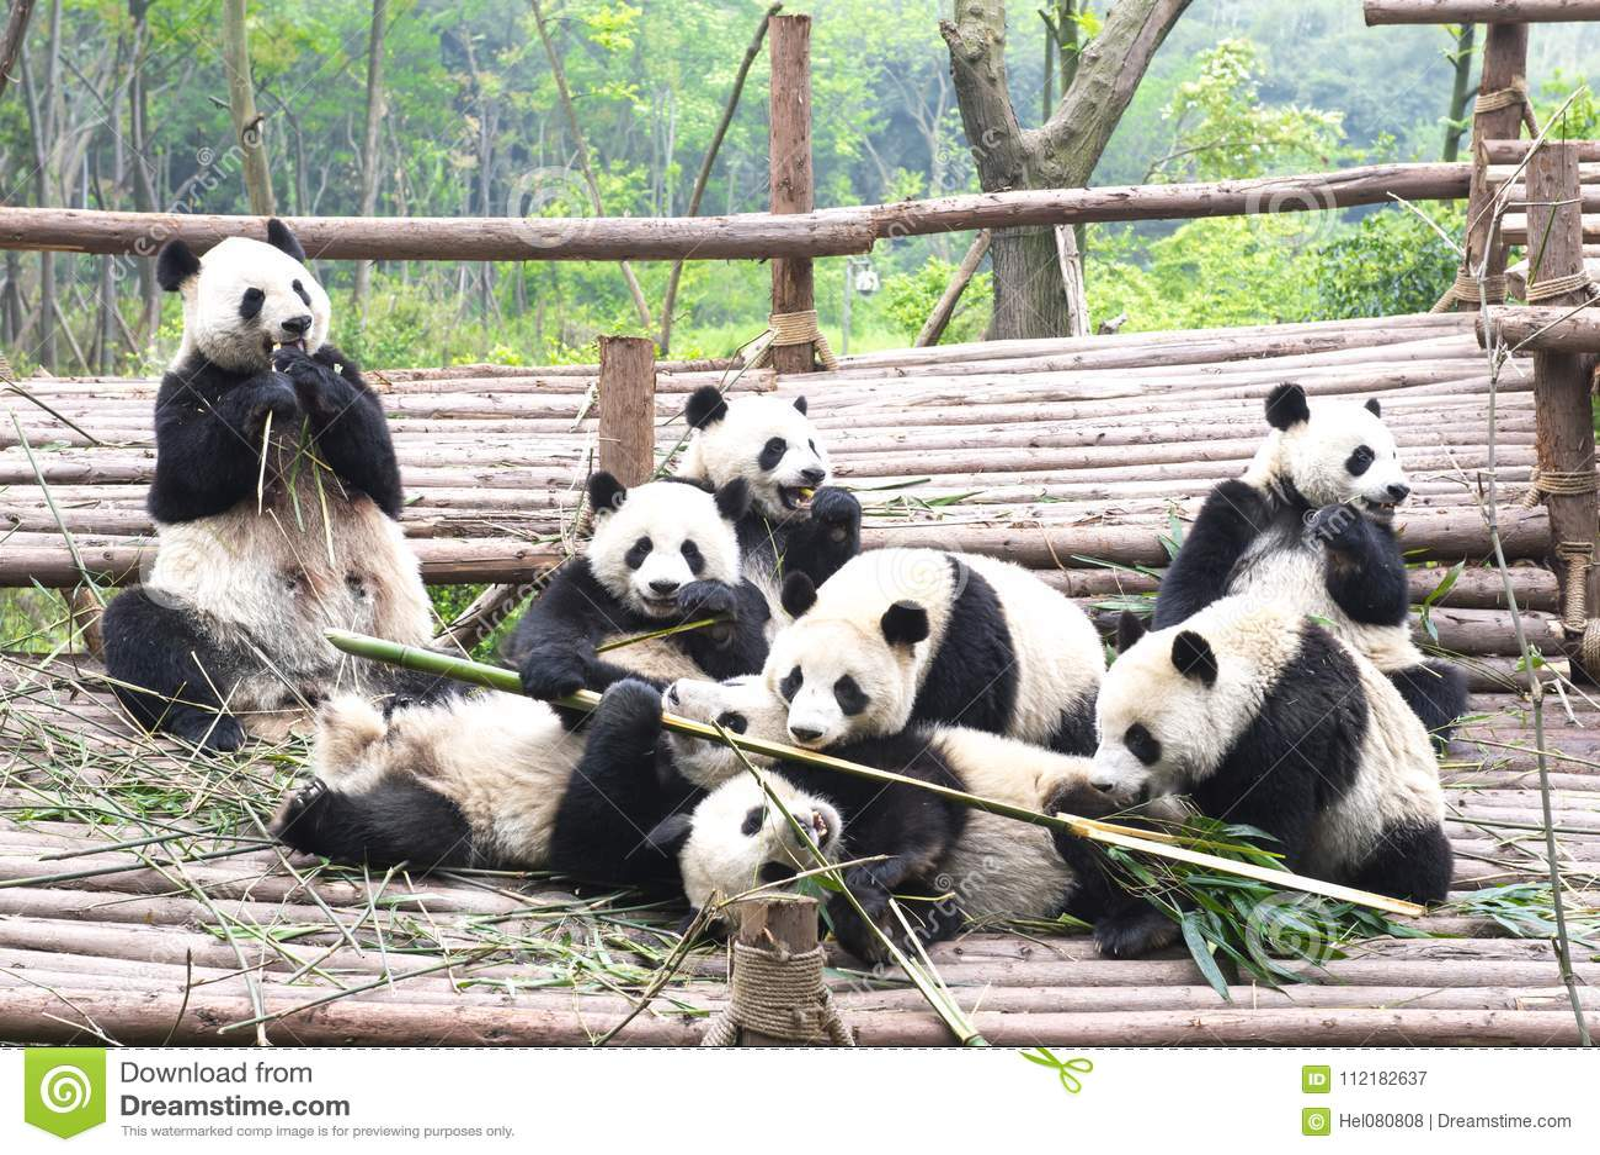 Giant Panda Cubs Playing Mother Panda Be...